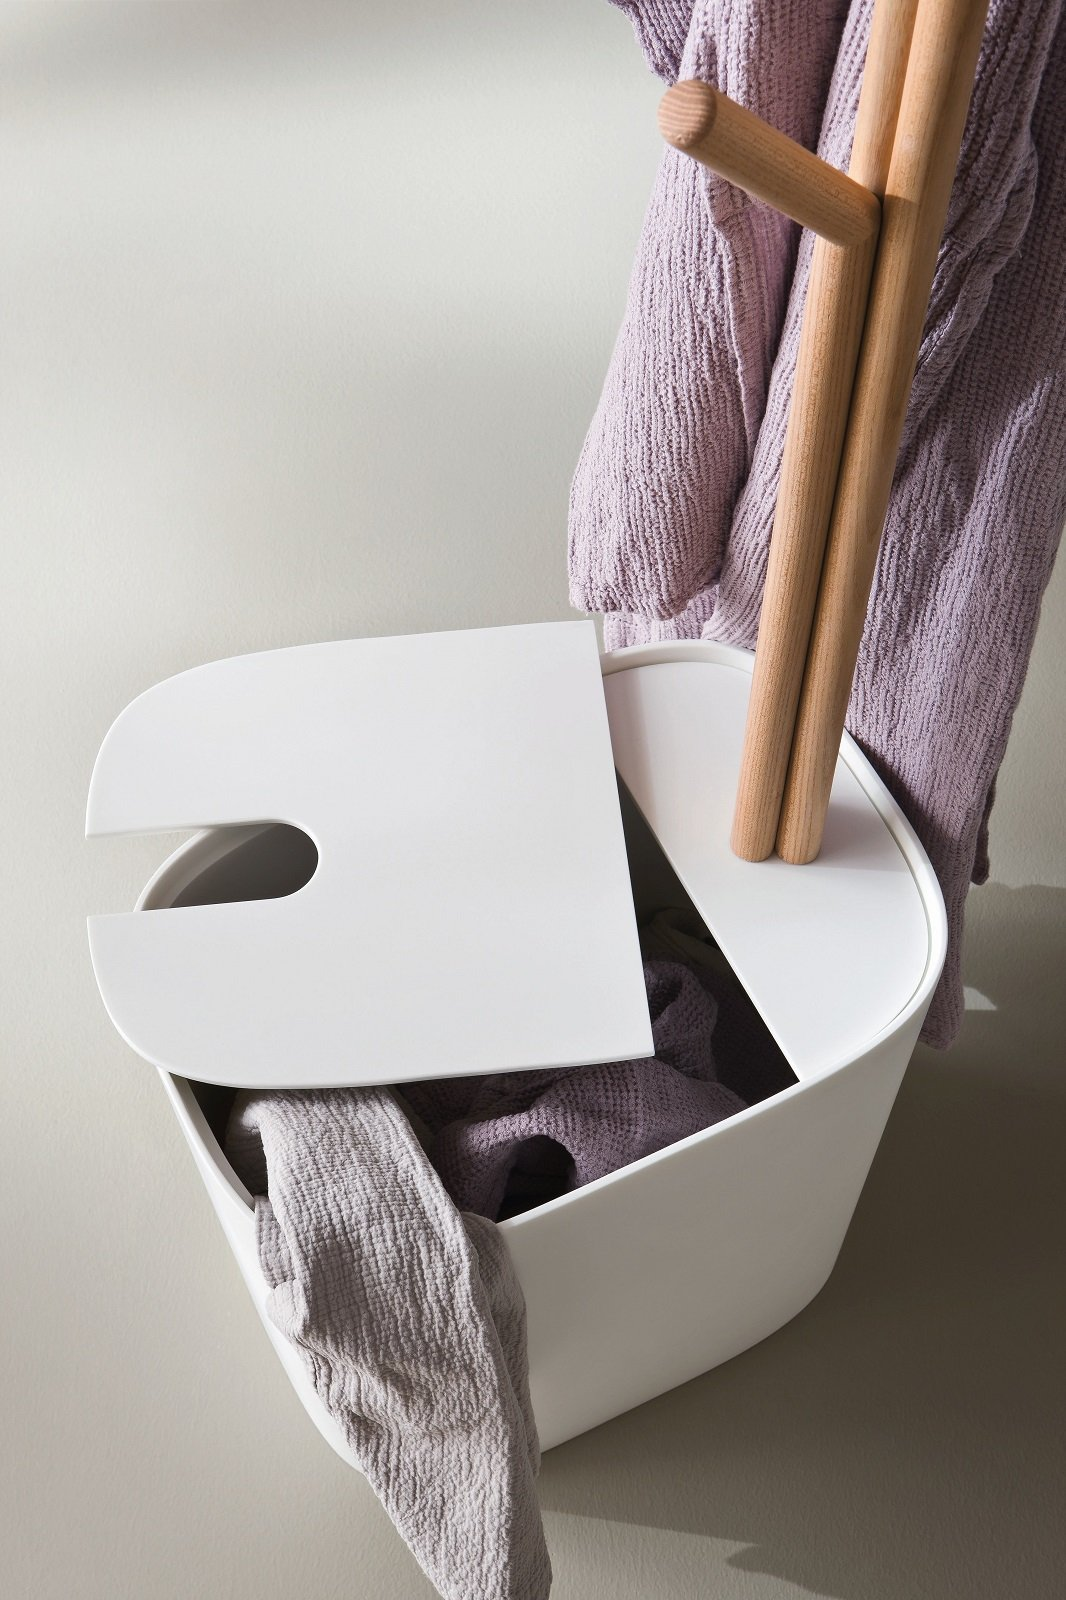 Cesta Bucato Leroy Merlin portabiancheria, belli e igienici - cose di casa